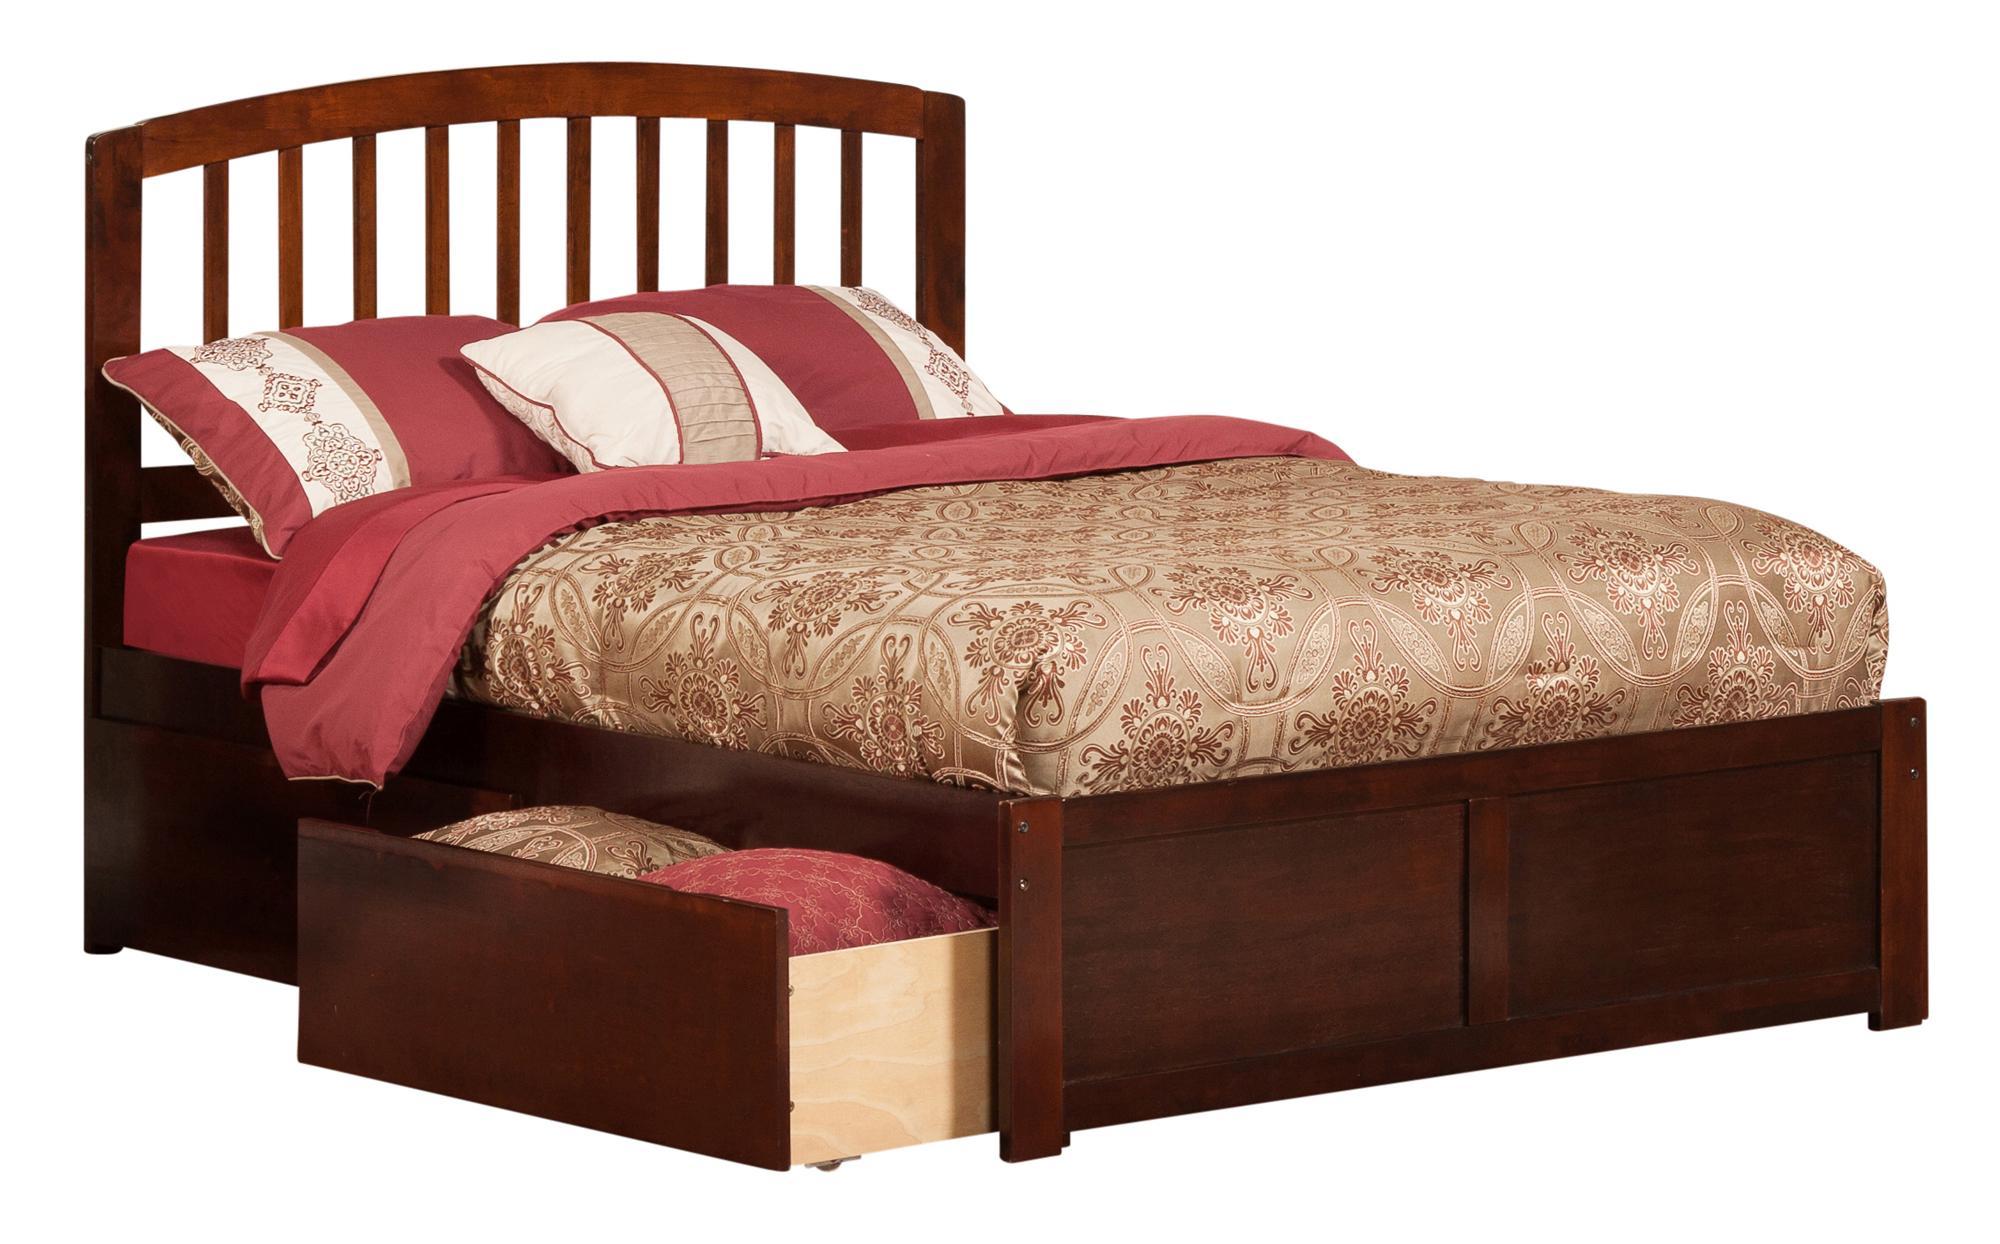 Atlantic Furniture And Bedding Latitude Run Platform